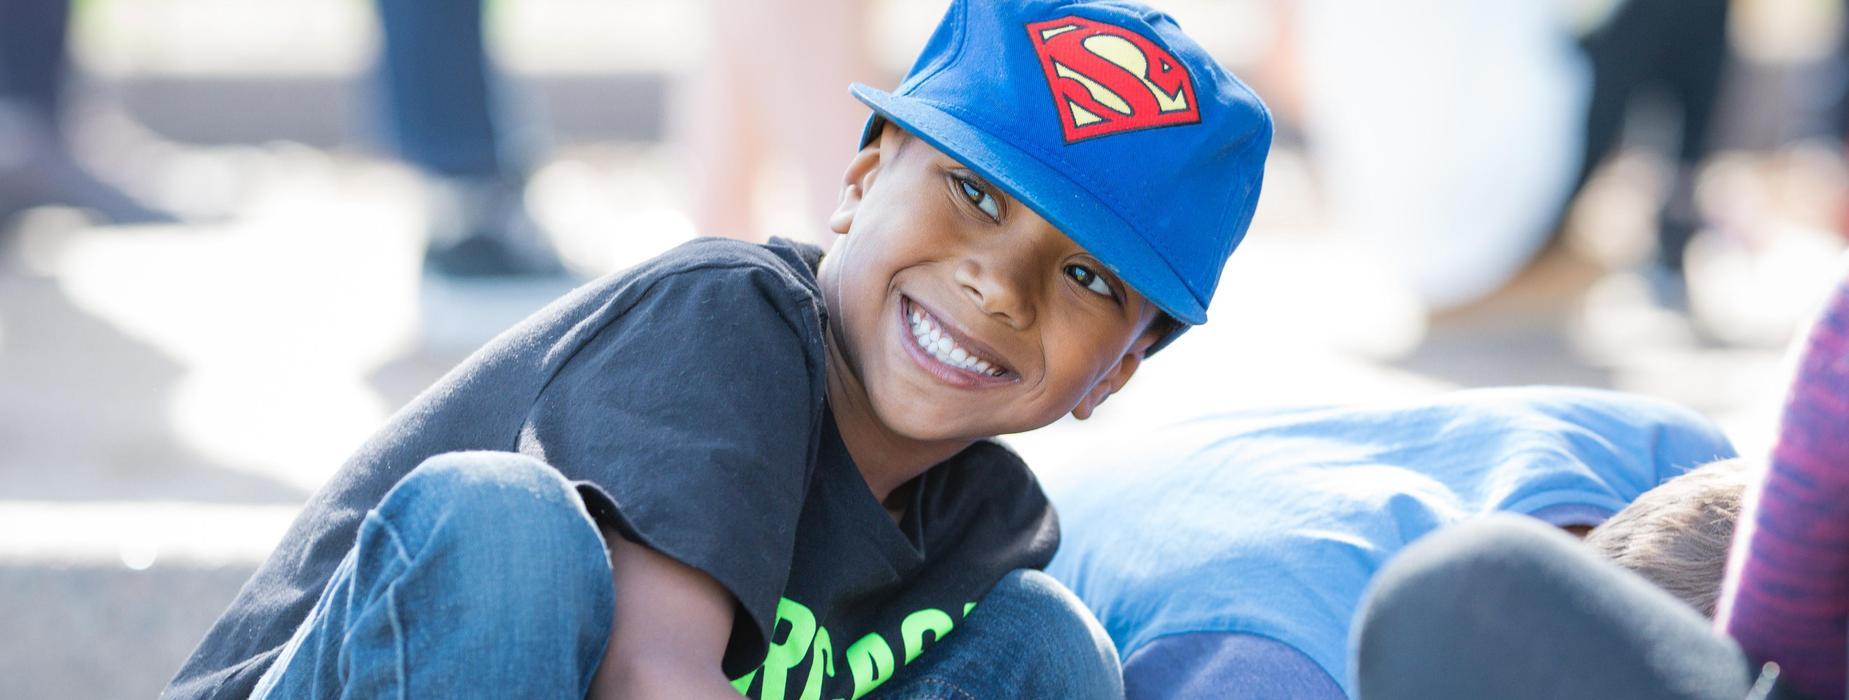 Smiling boy in blue cap. Field Day Fun!